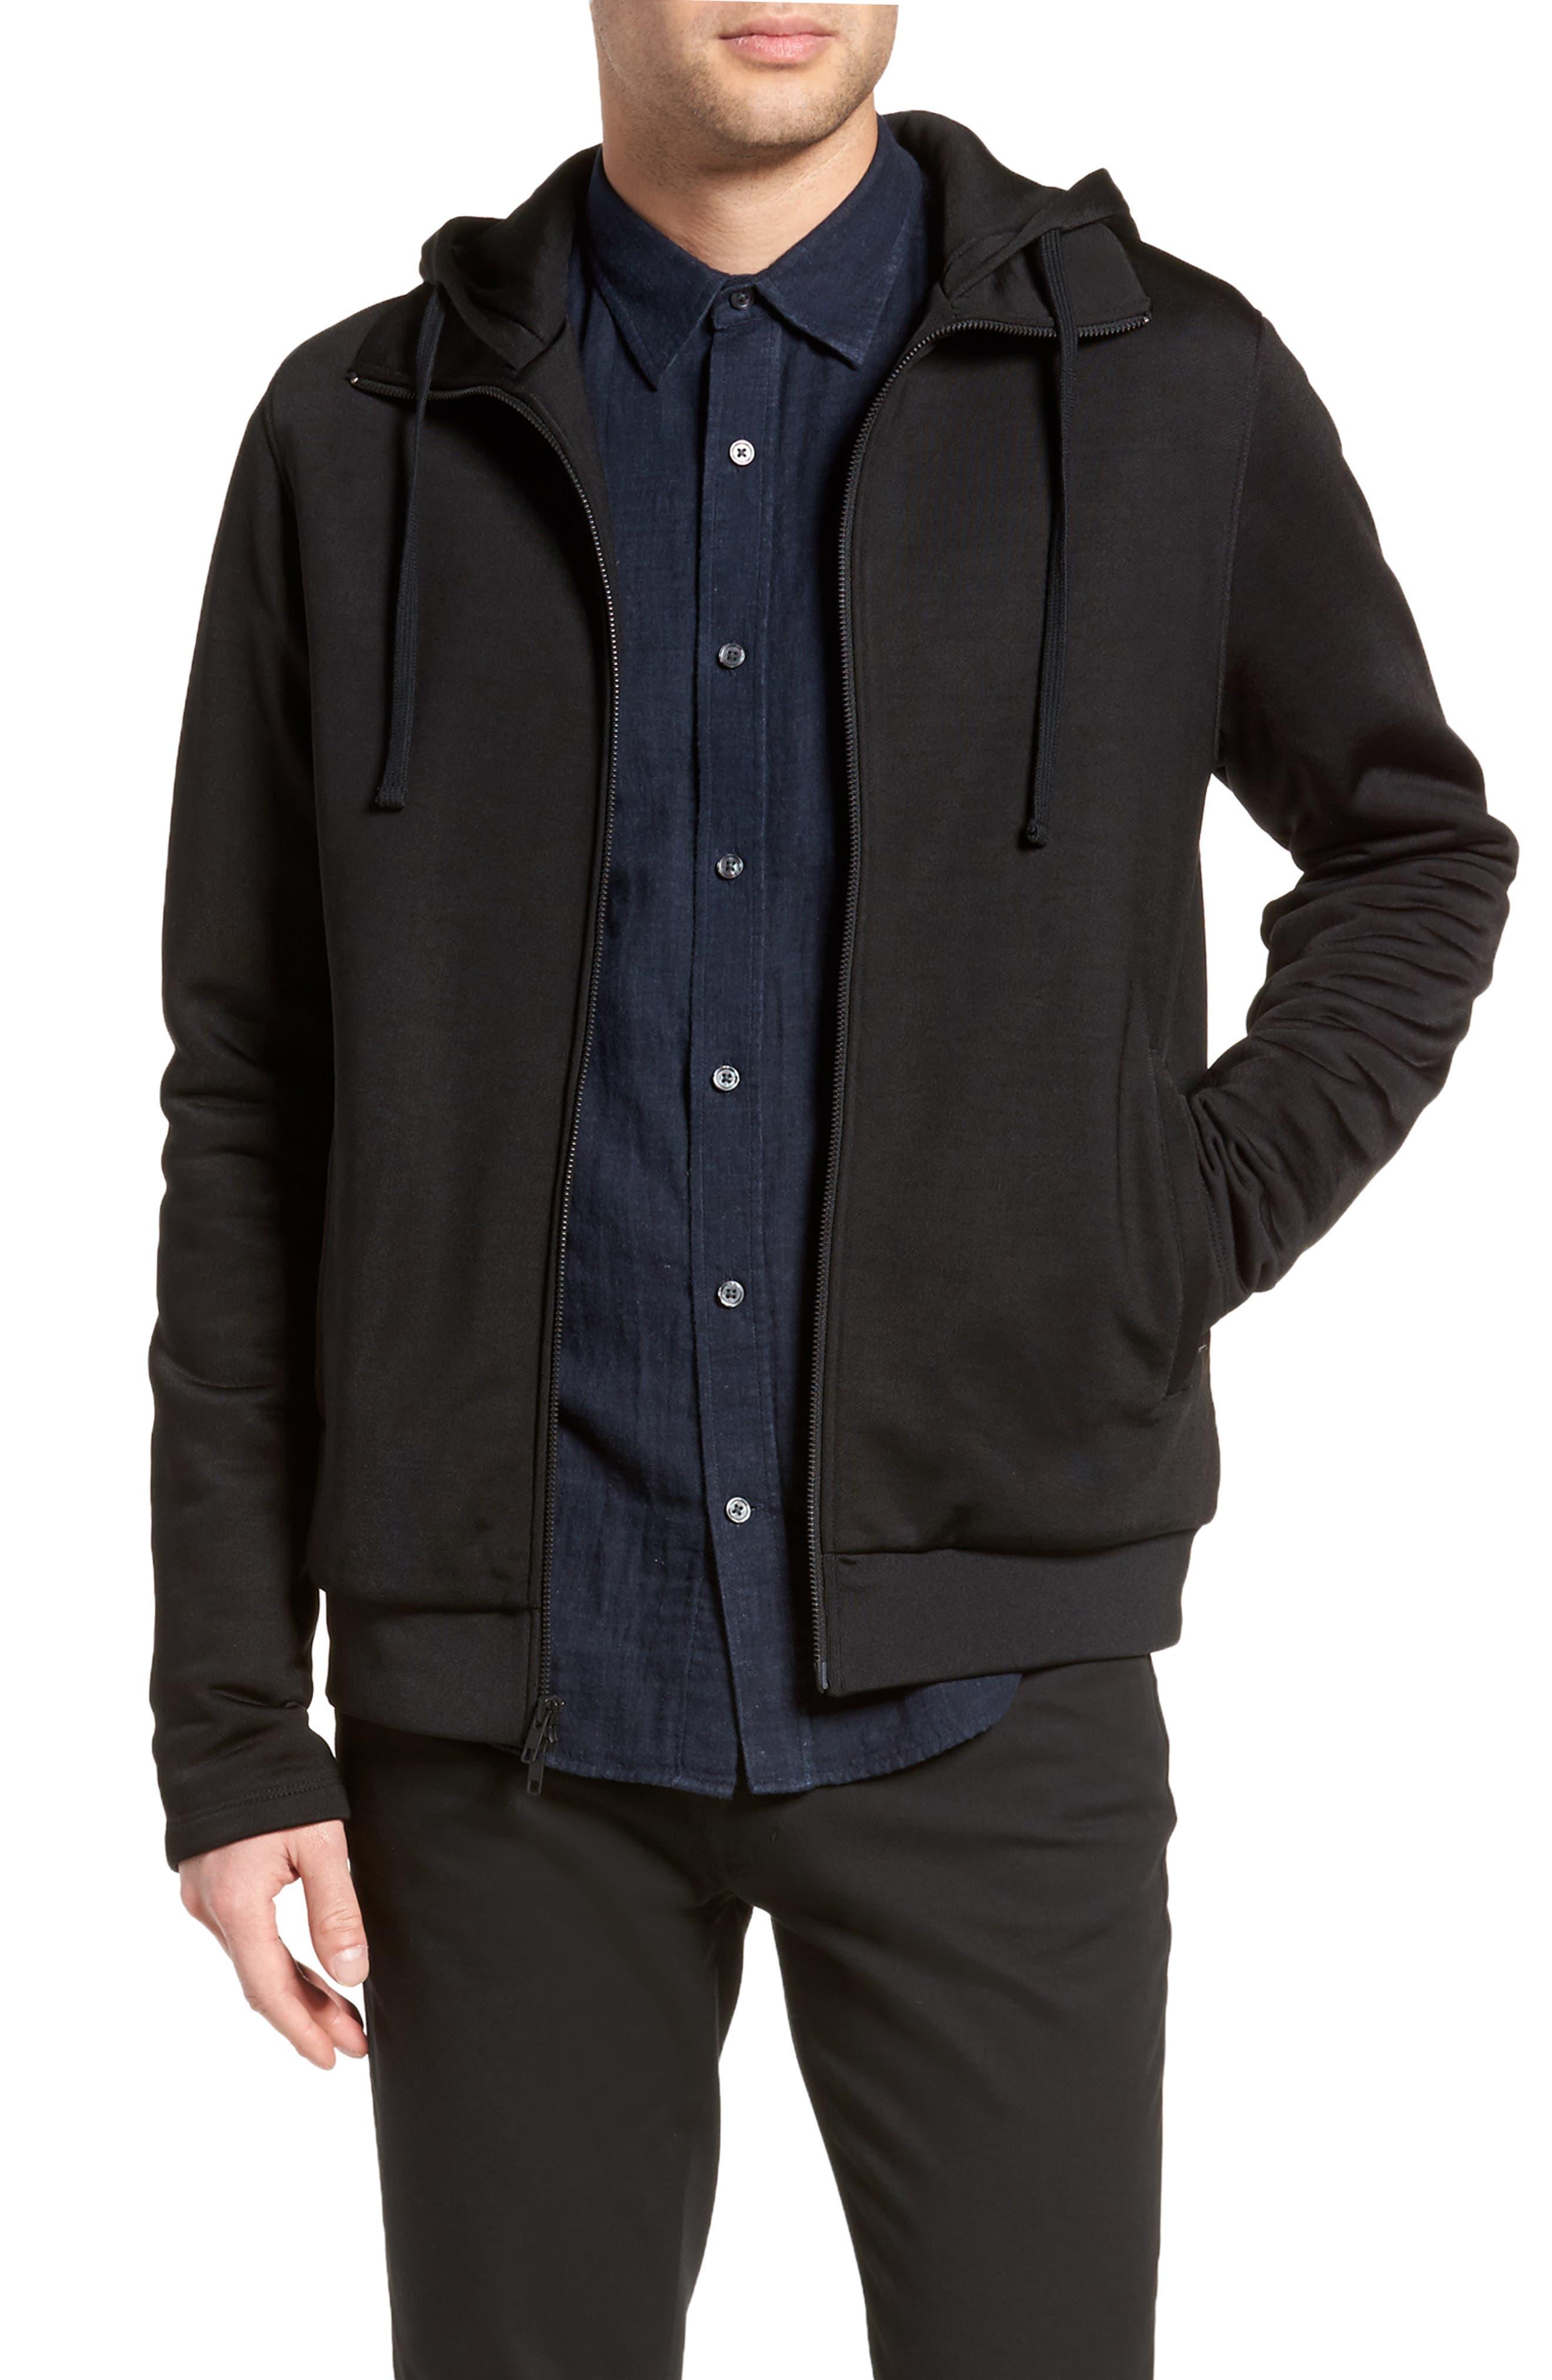 Regular Fit Zip Hoodie,                         Main,                         color, 001